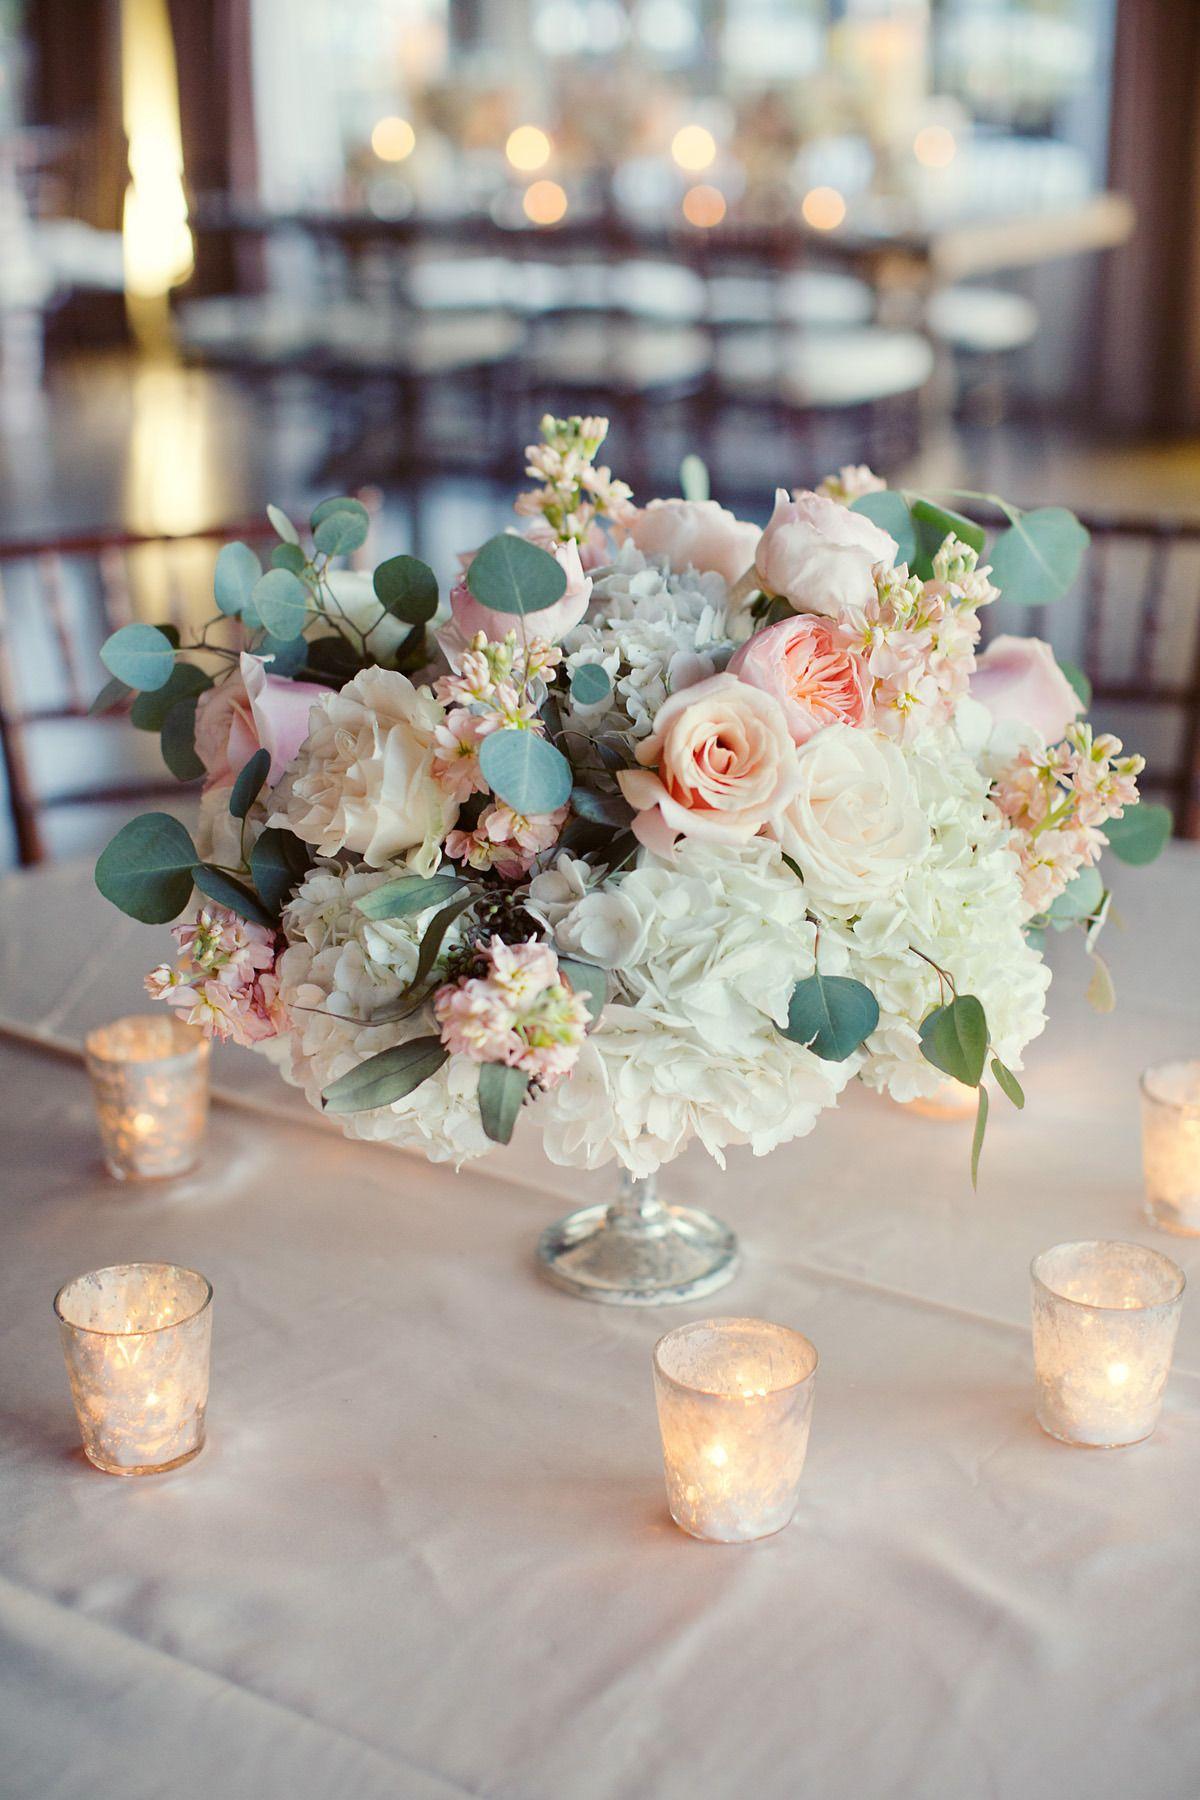 Urban English Garden Inspired Wedding With Images Candle Wedding Centerpieces Wedding Centerpieces Rose Centerpieces